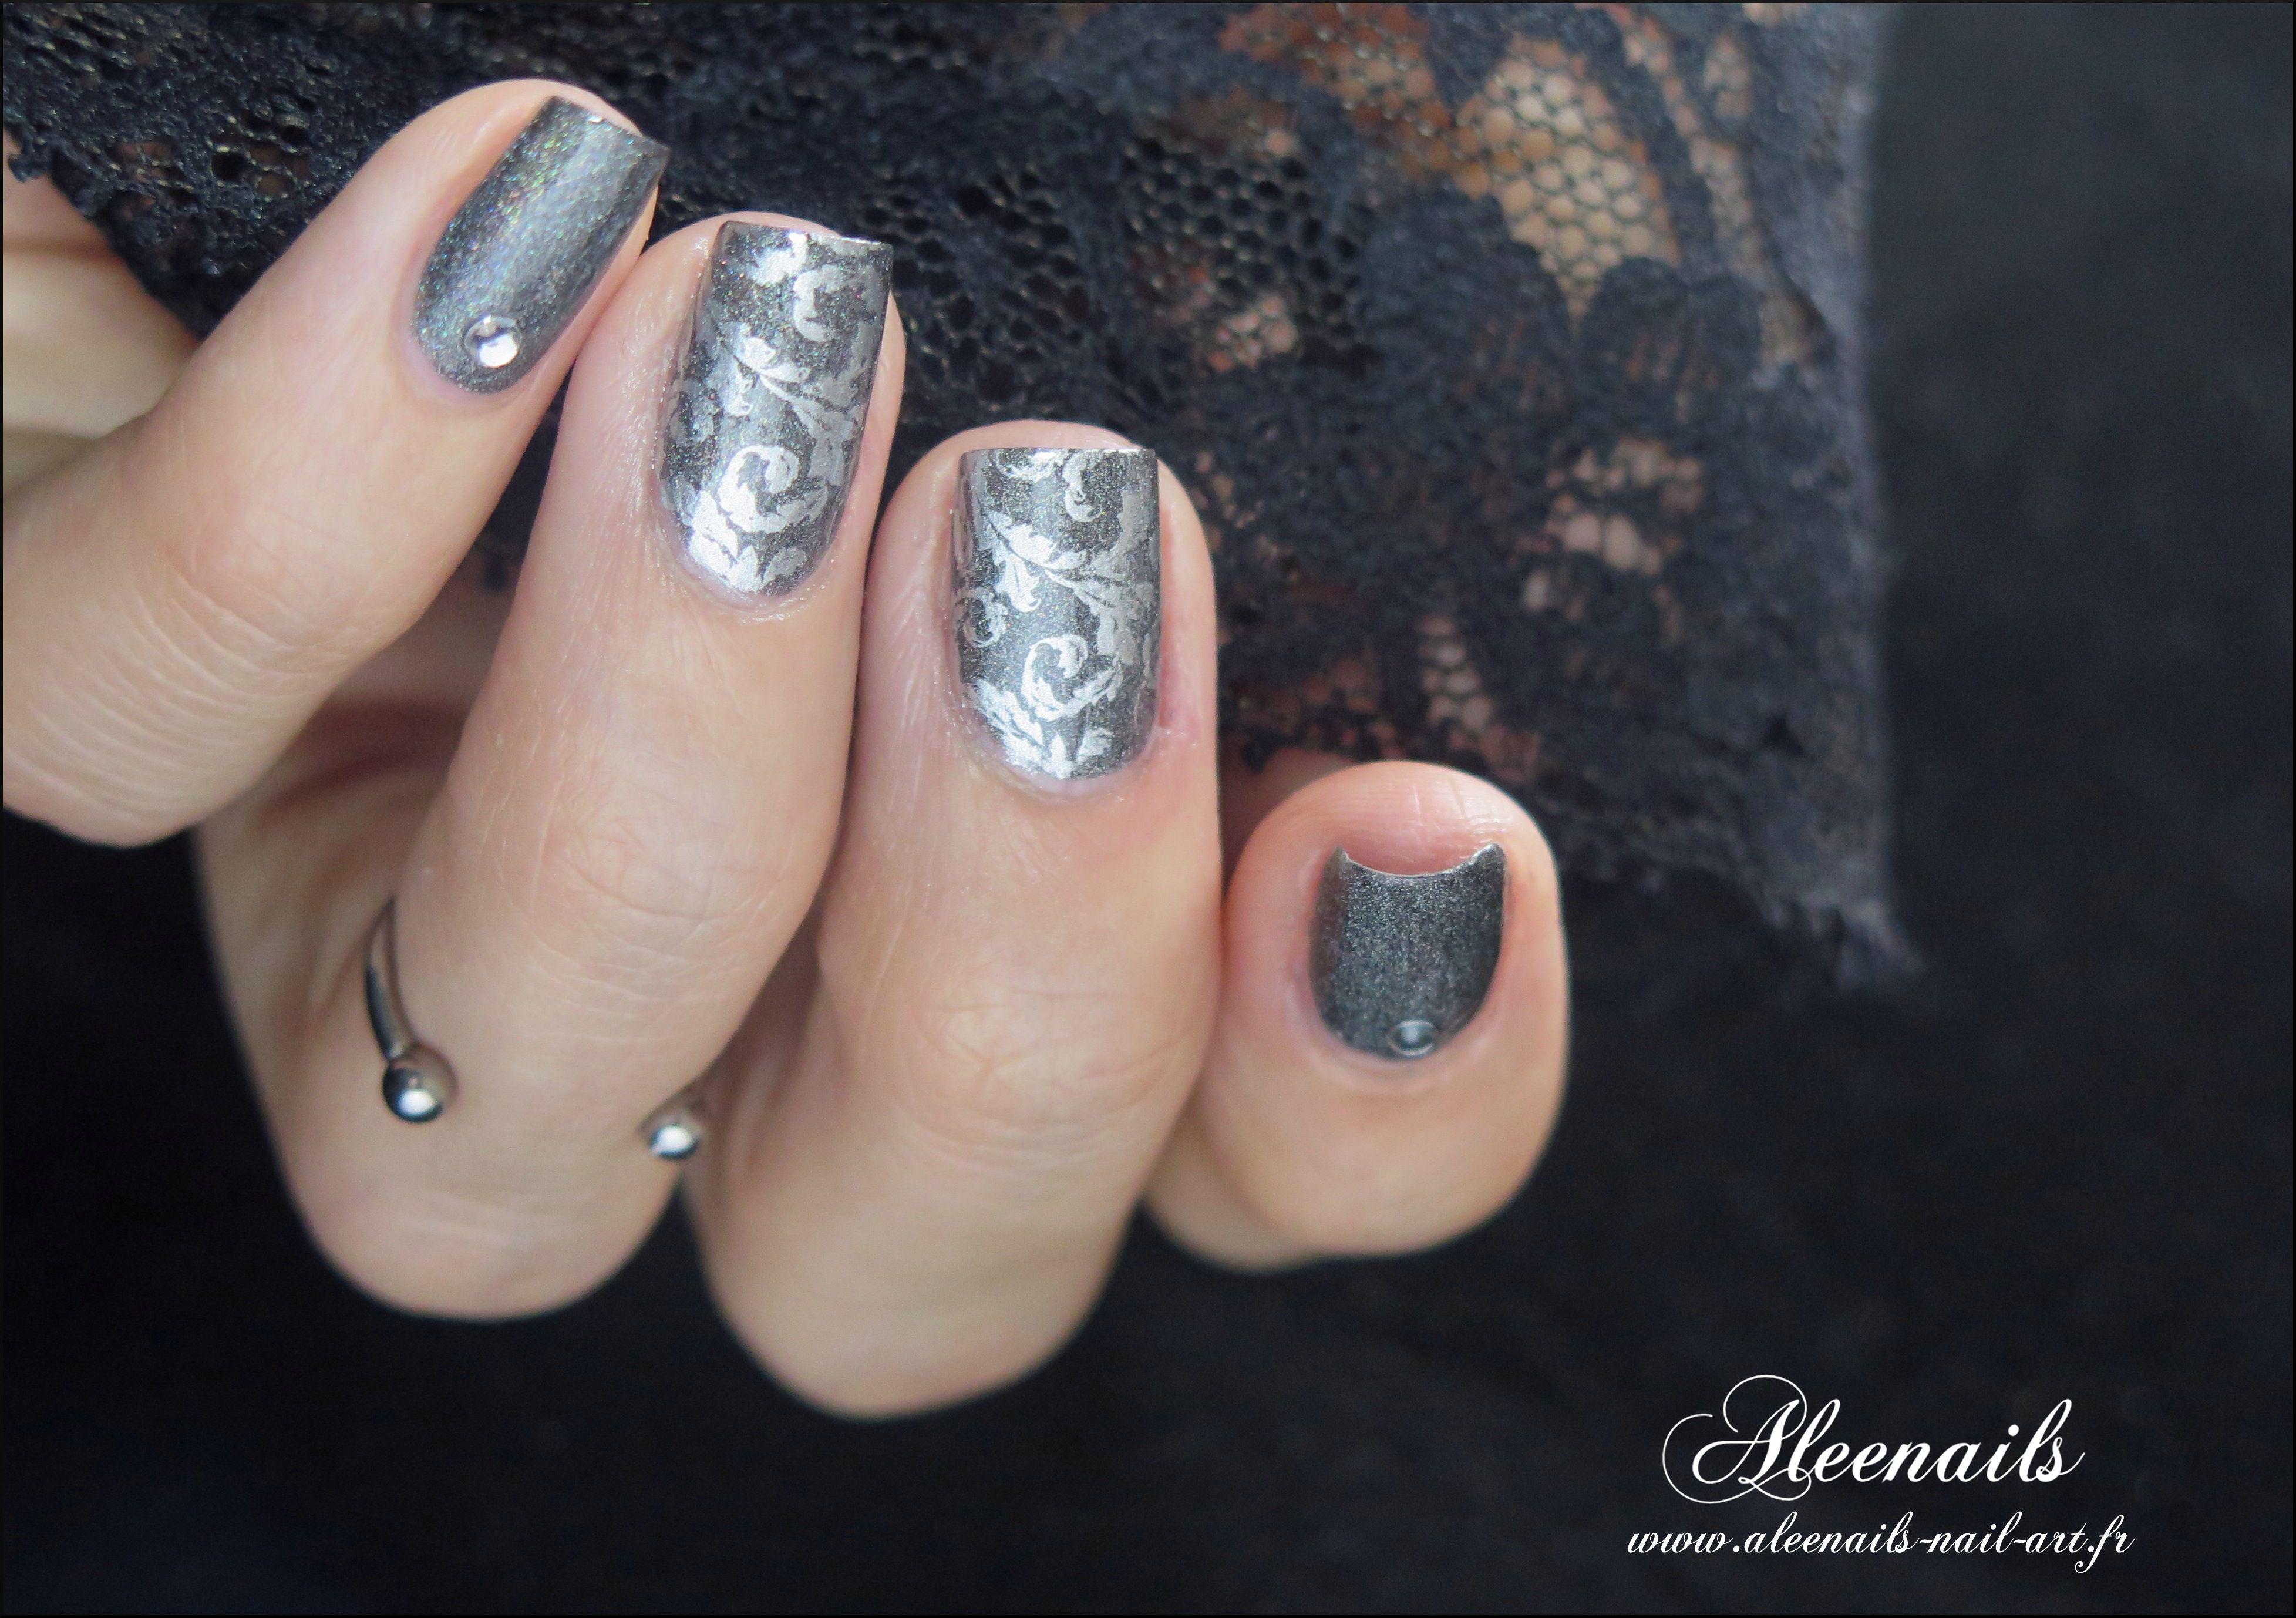 http://aleenails-nail-art.fr/feuilles-dargent-avec-born-pretty-store ...